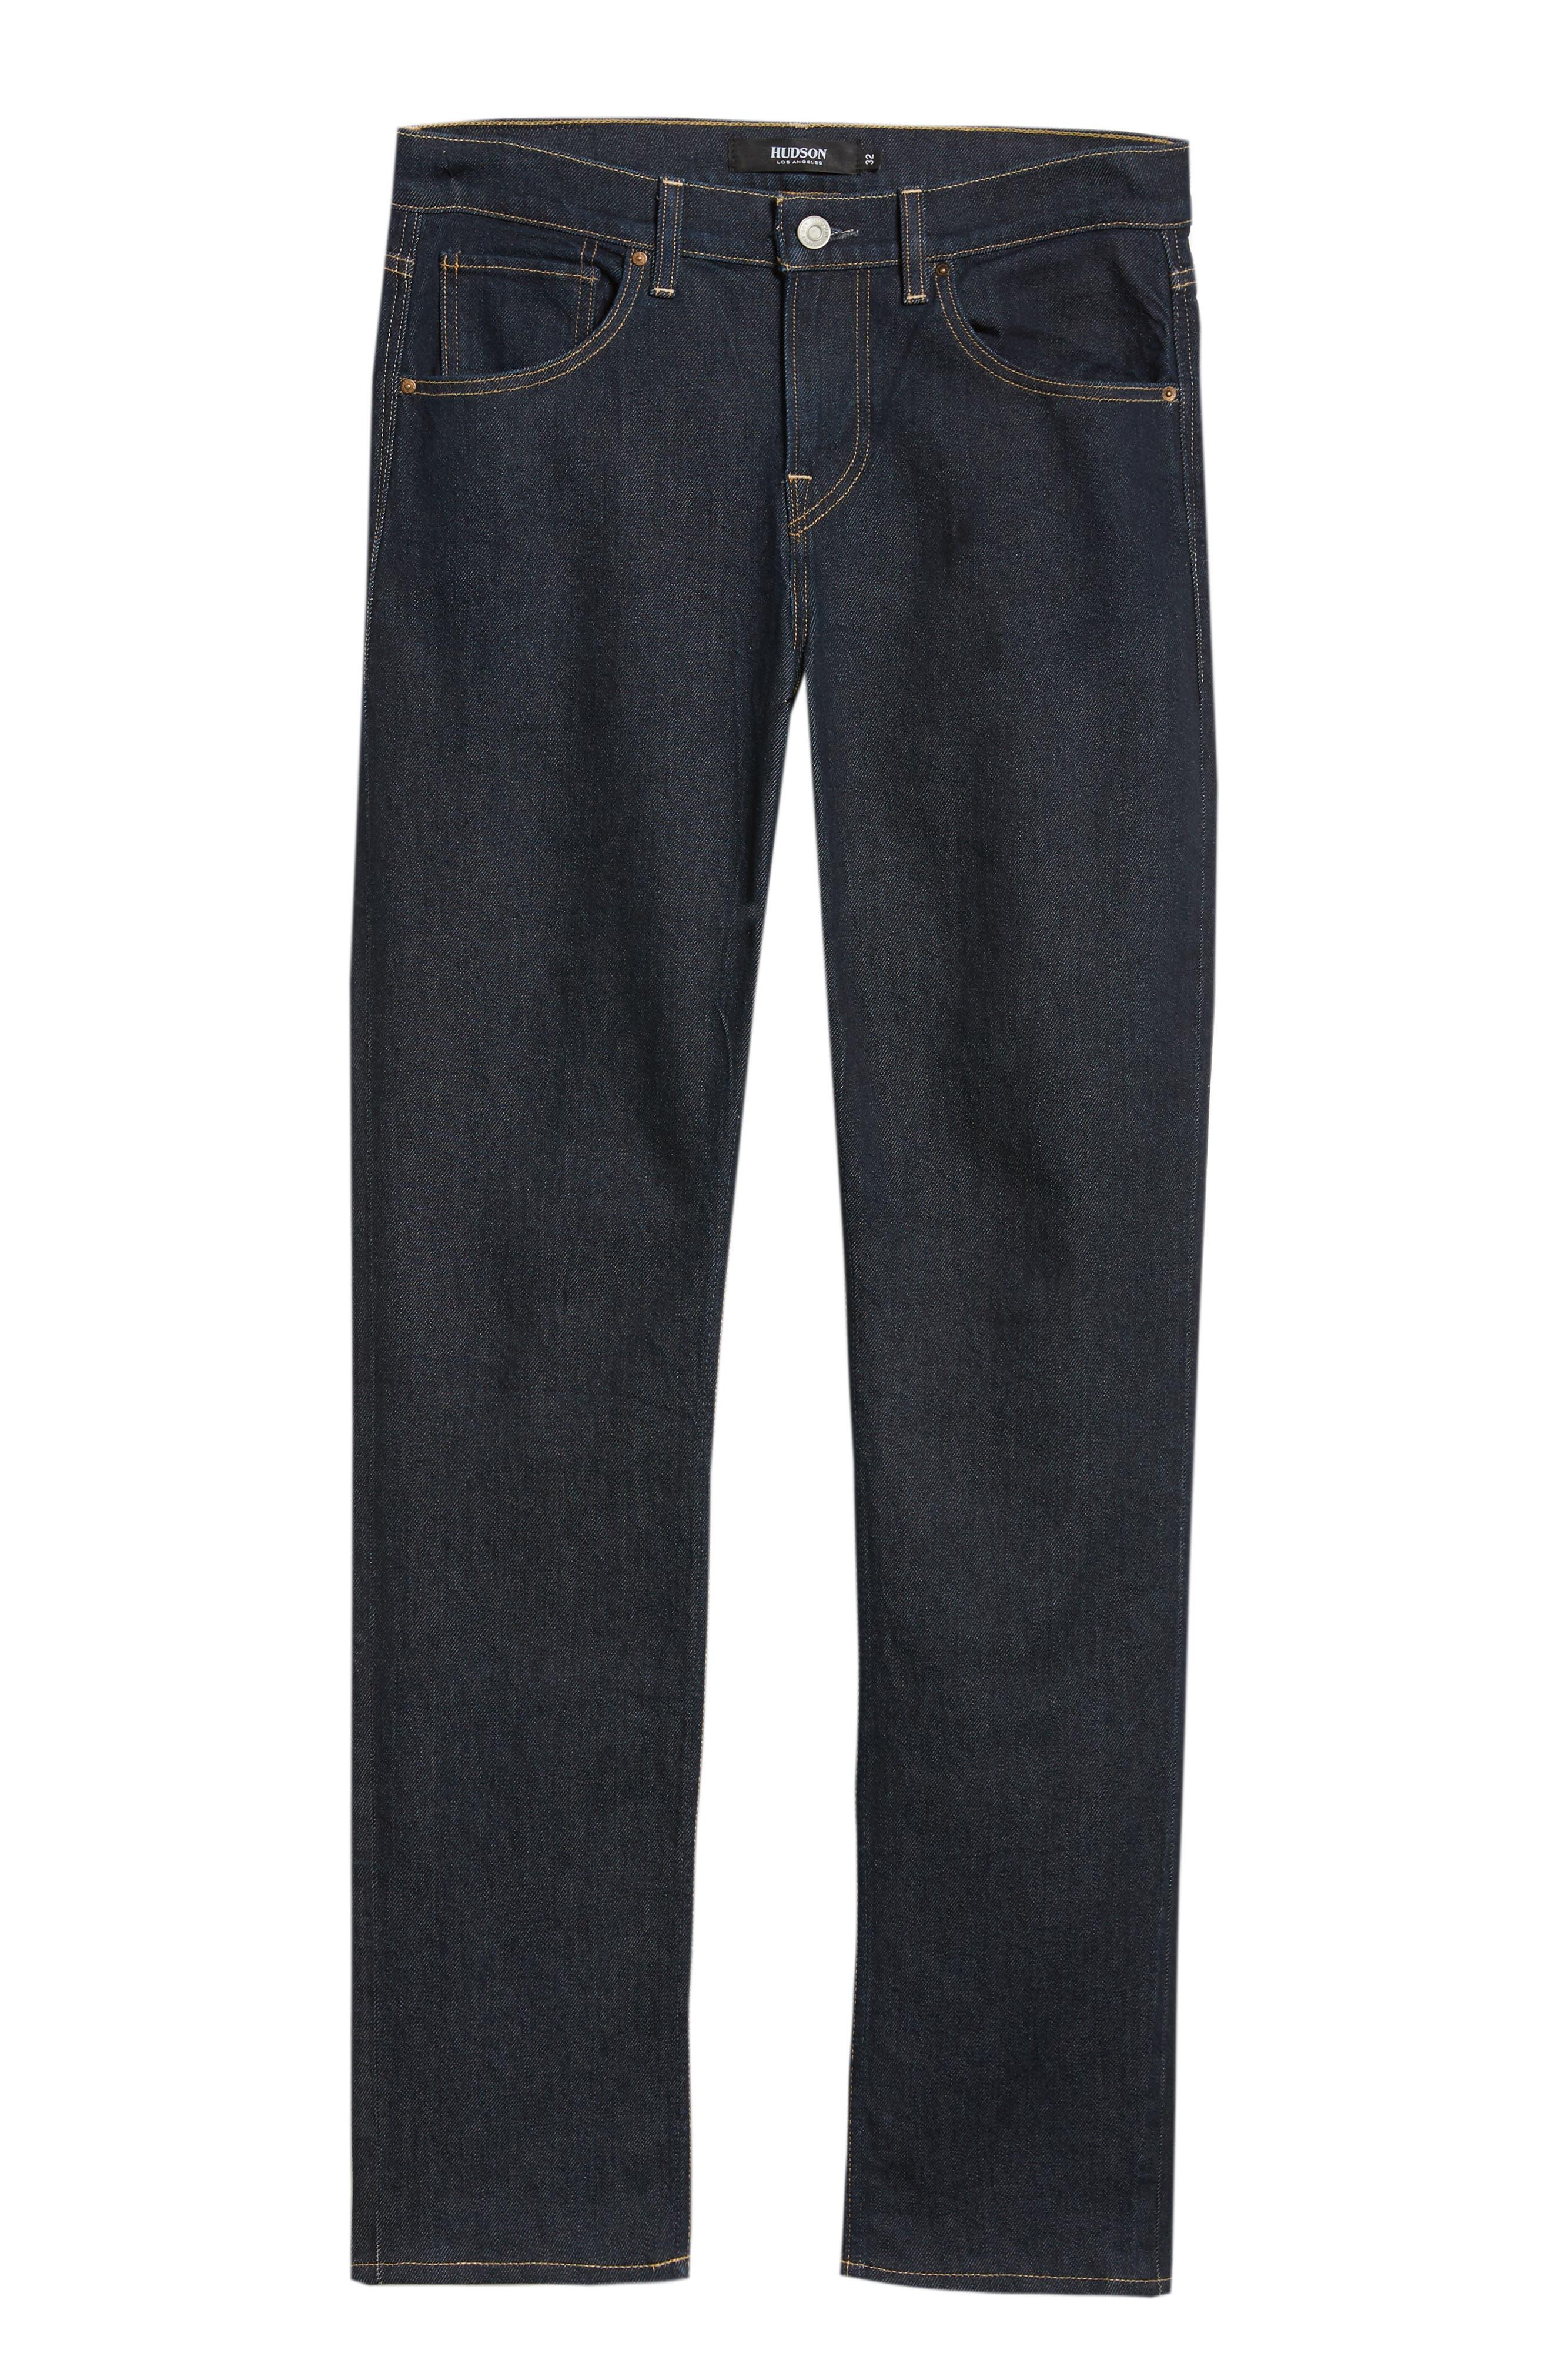 Blake Slim Fit Jeans,                             Alternate thumbnail 6, color,                             DUARTE